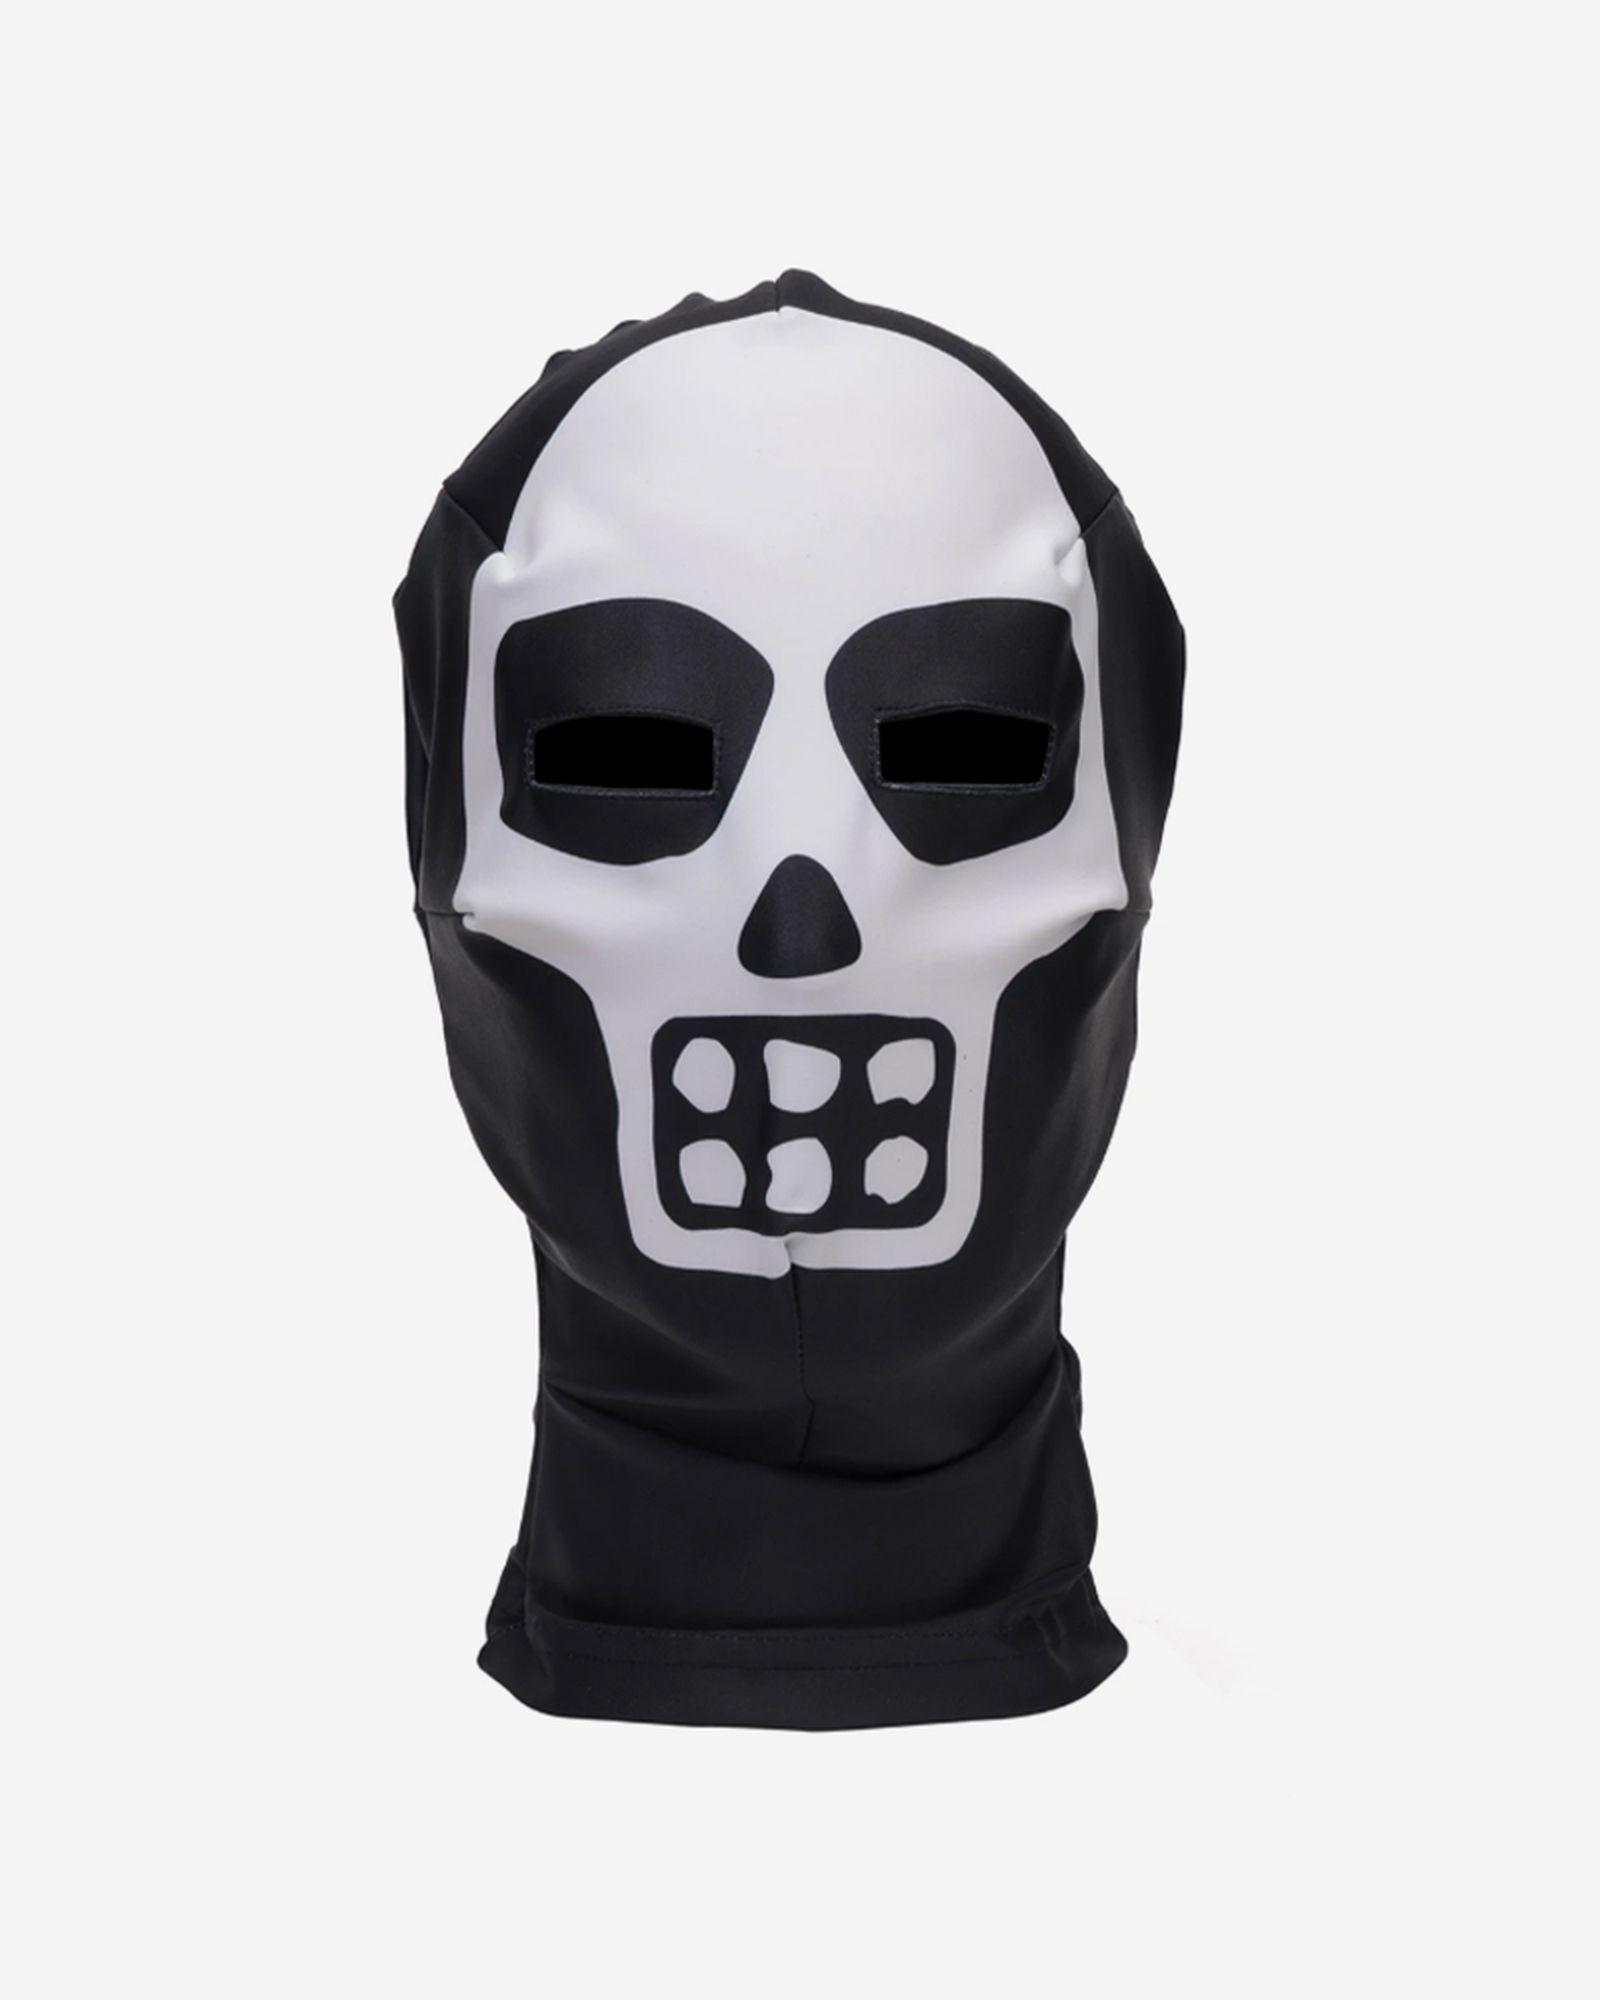 kanye-west-skull-mask-01